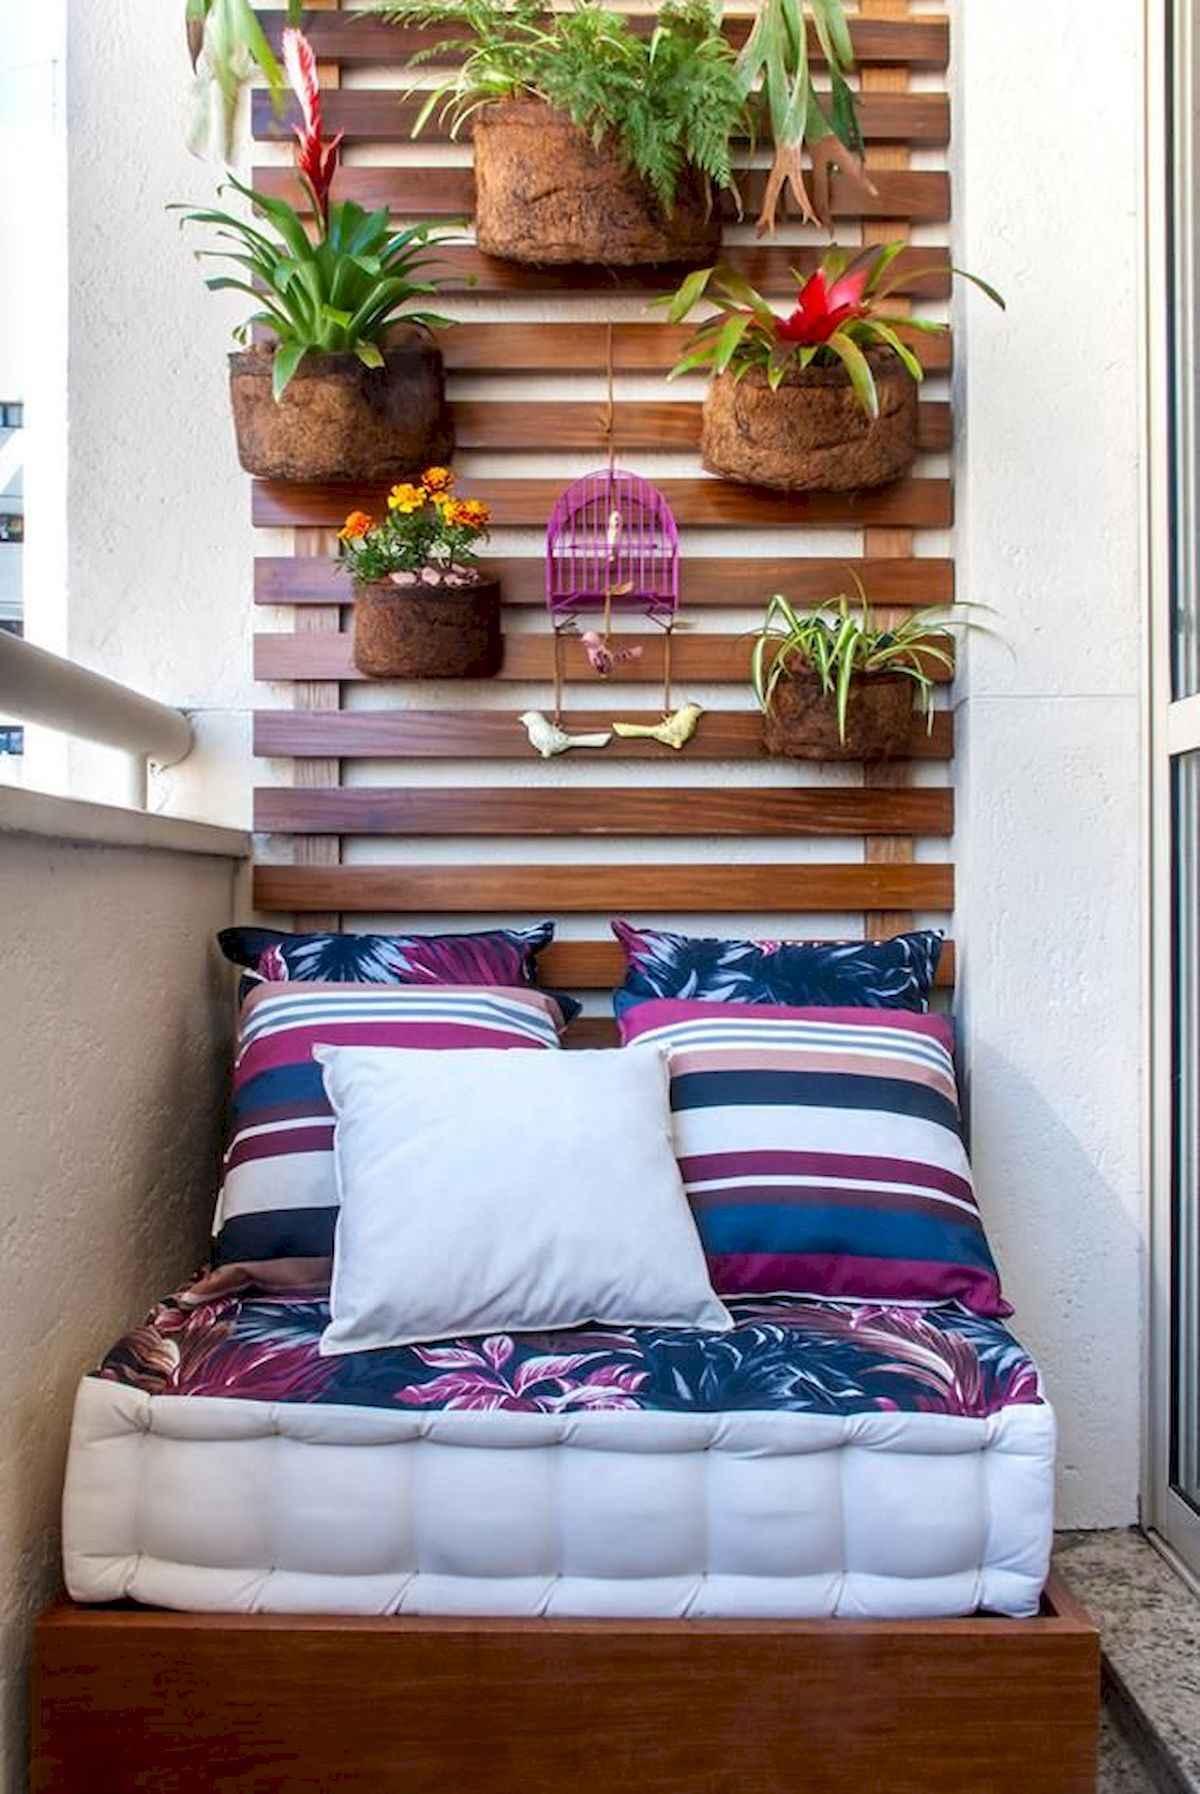 80 Small Apartment Balcony Decor Ideas And Makeover (14)